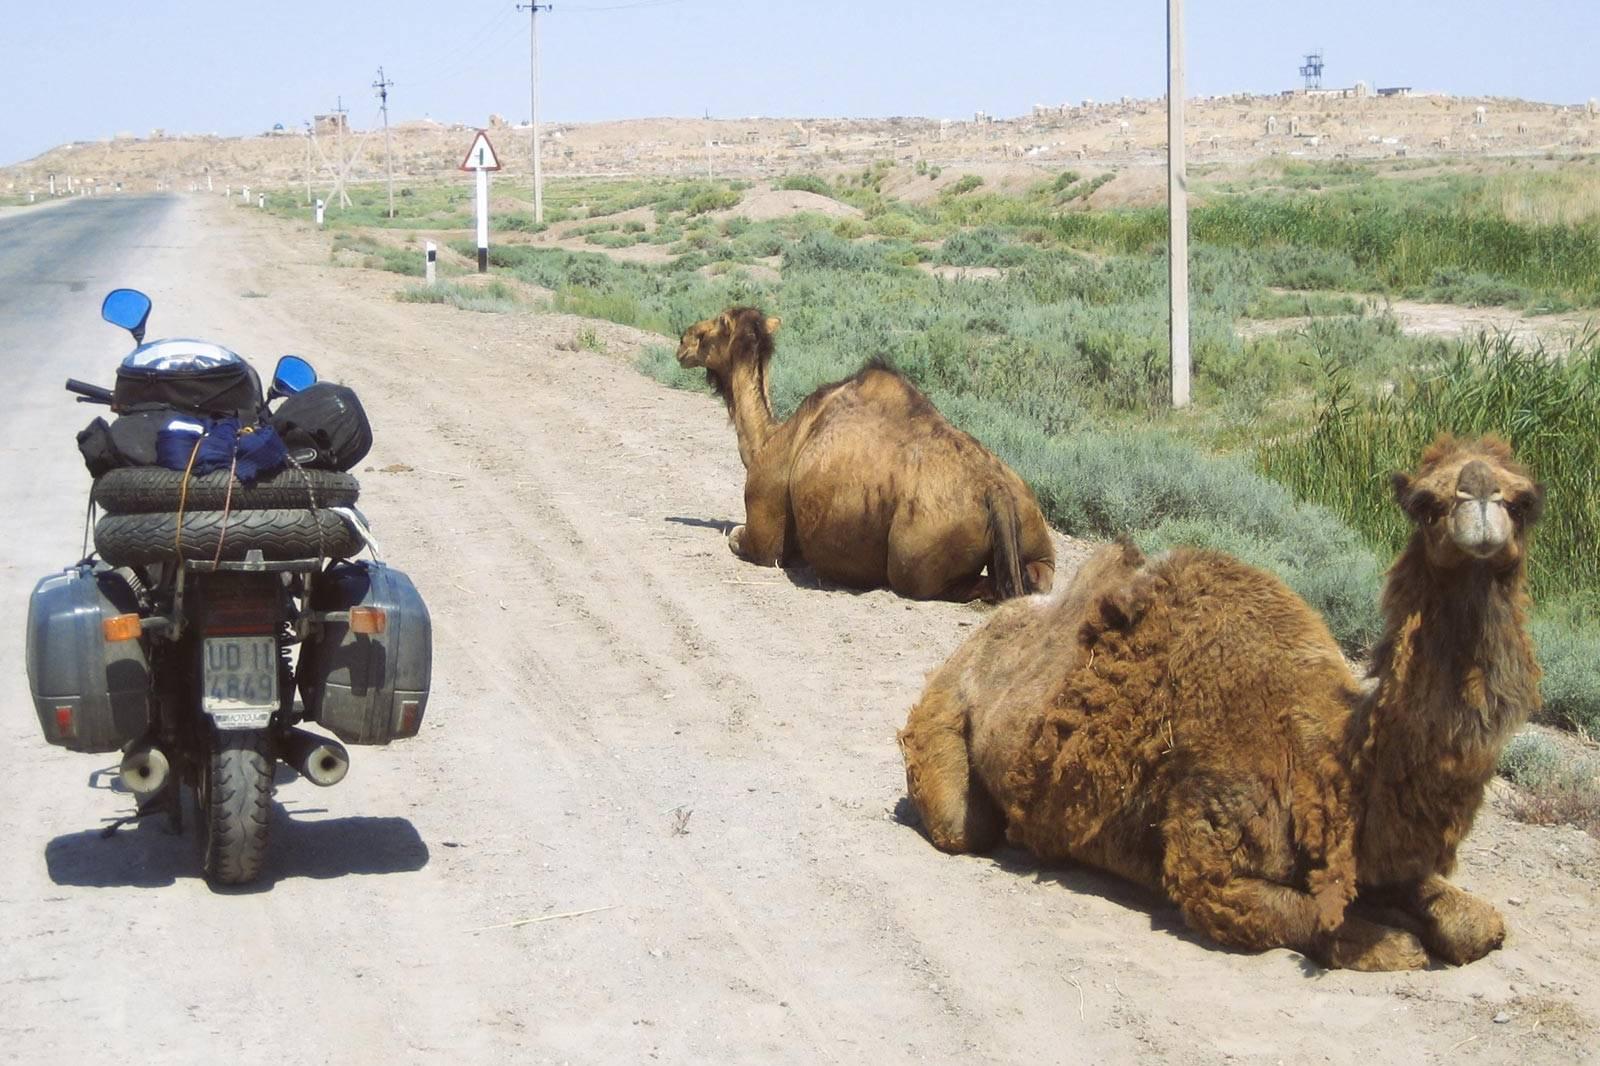 Joyside Jeio passaggio di confine Turkmenistan Uzbekistan